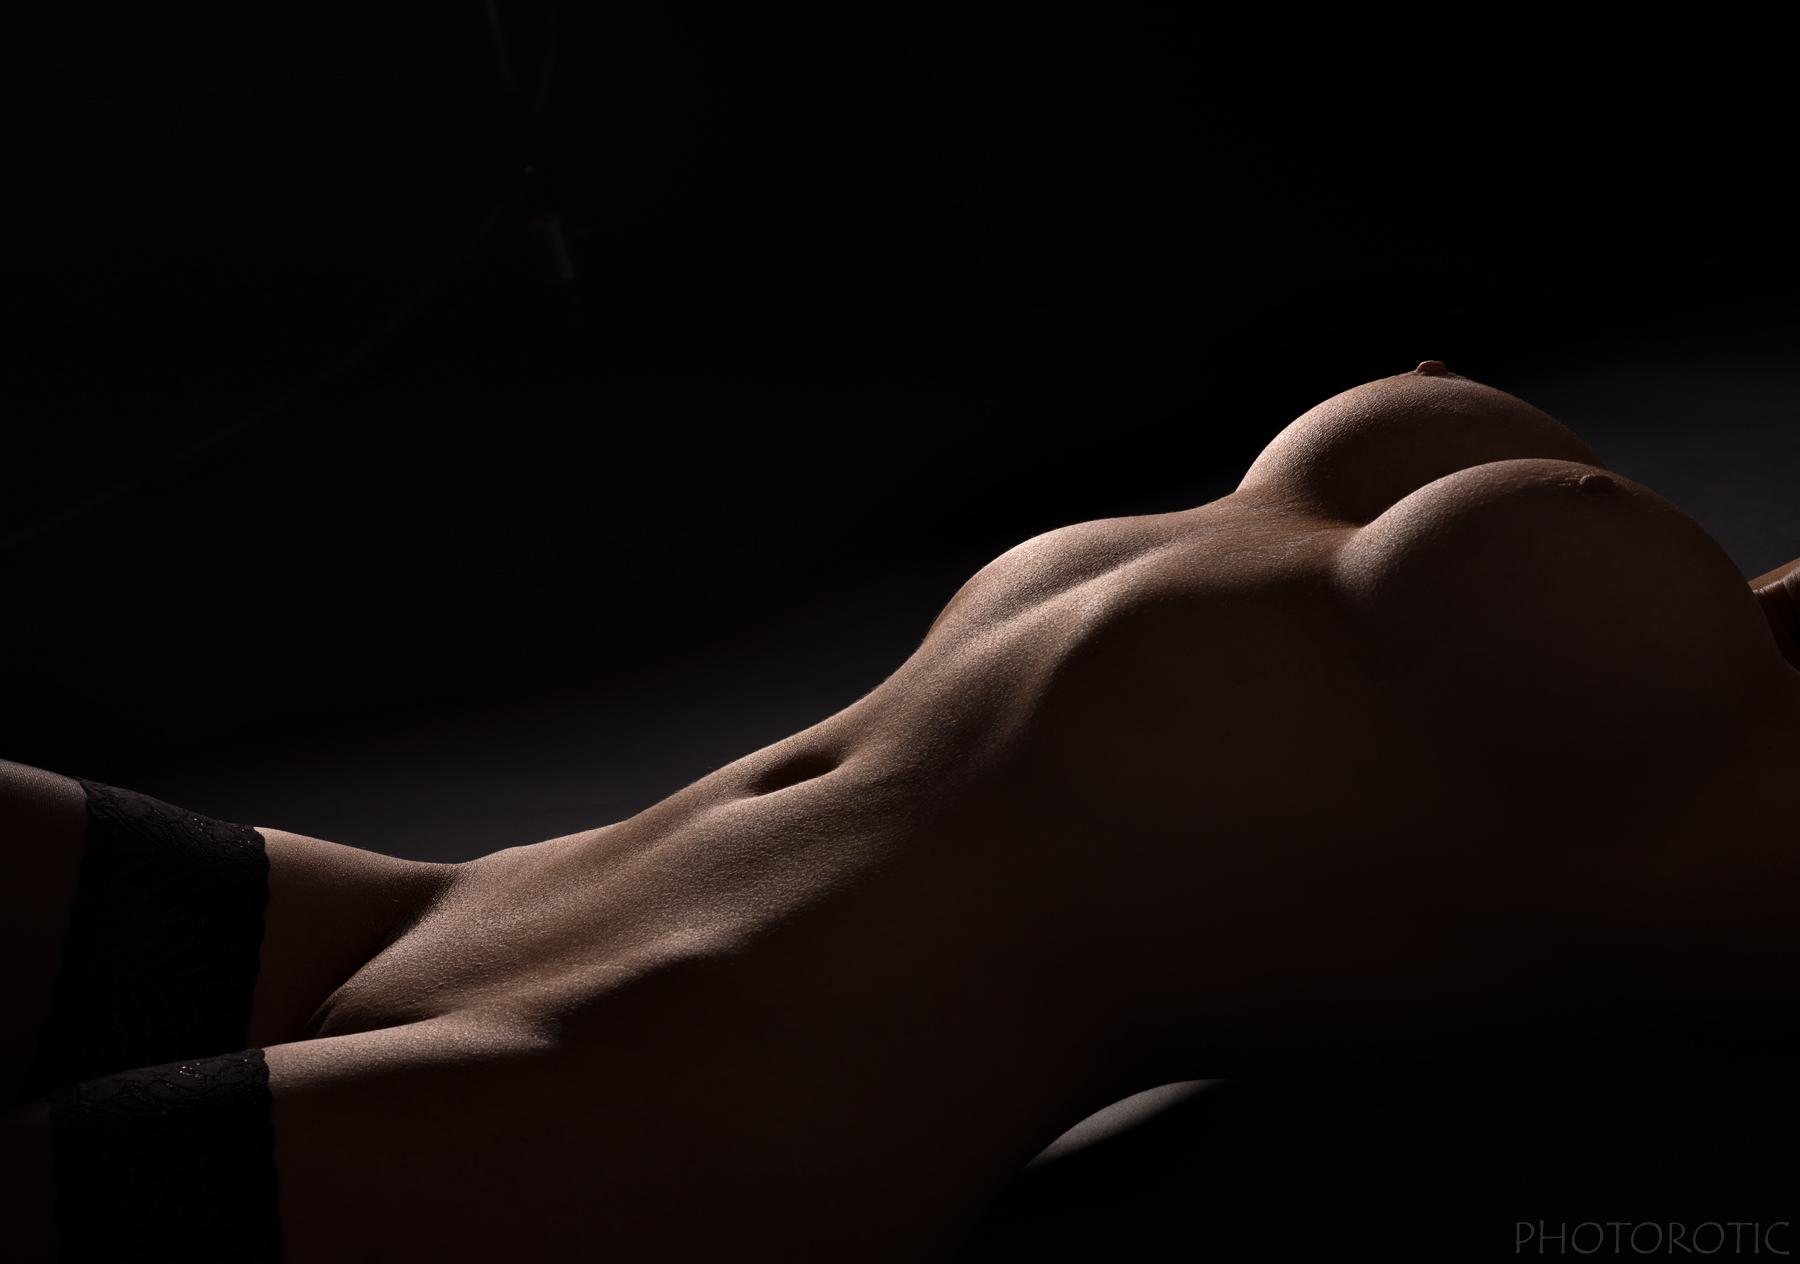 krasivoe-zhenskoe-telo-fotografii-goloe